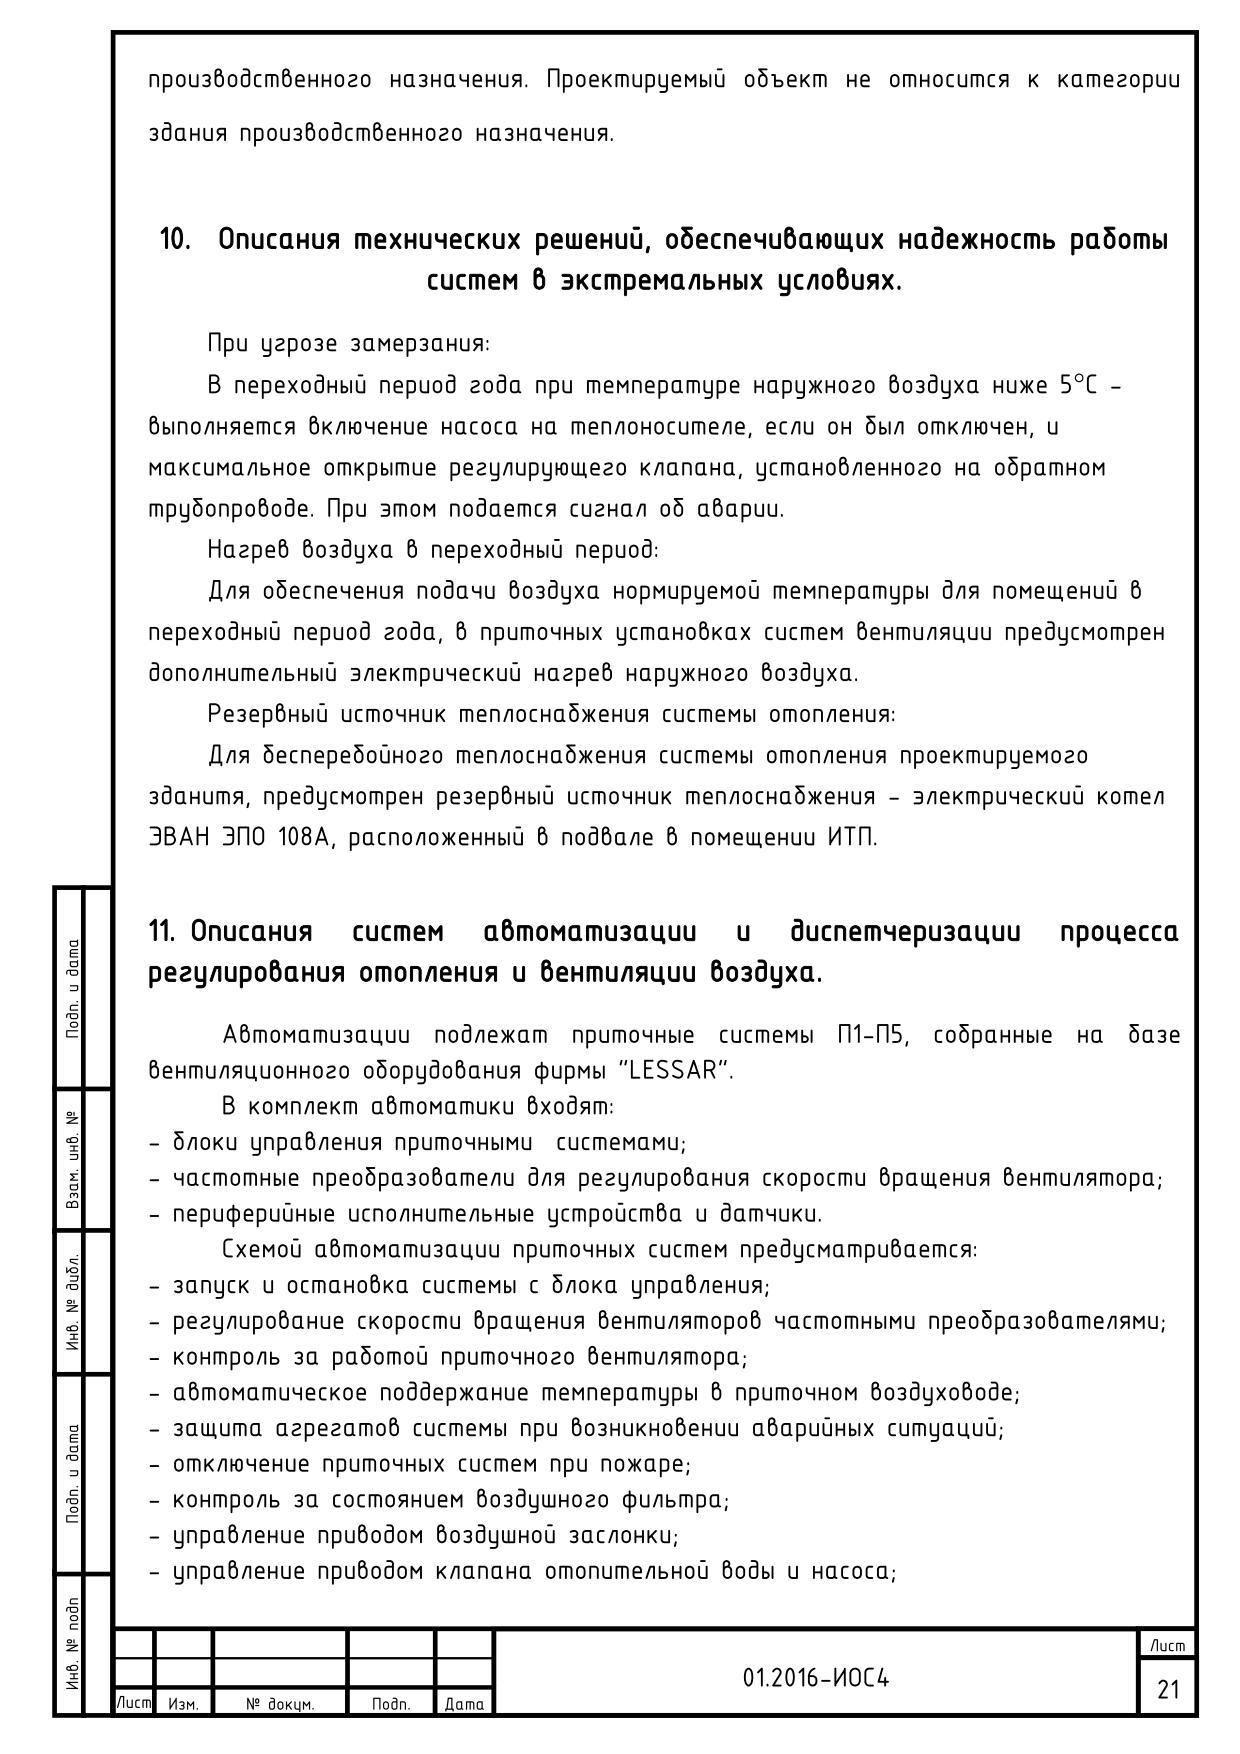 Депо 12-37-0022